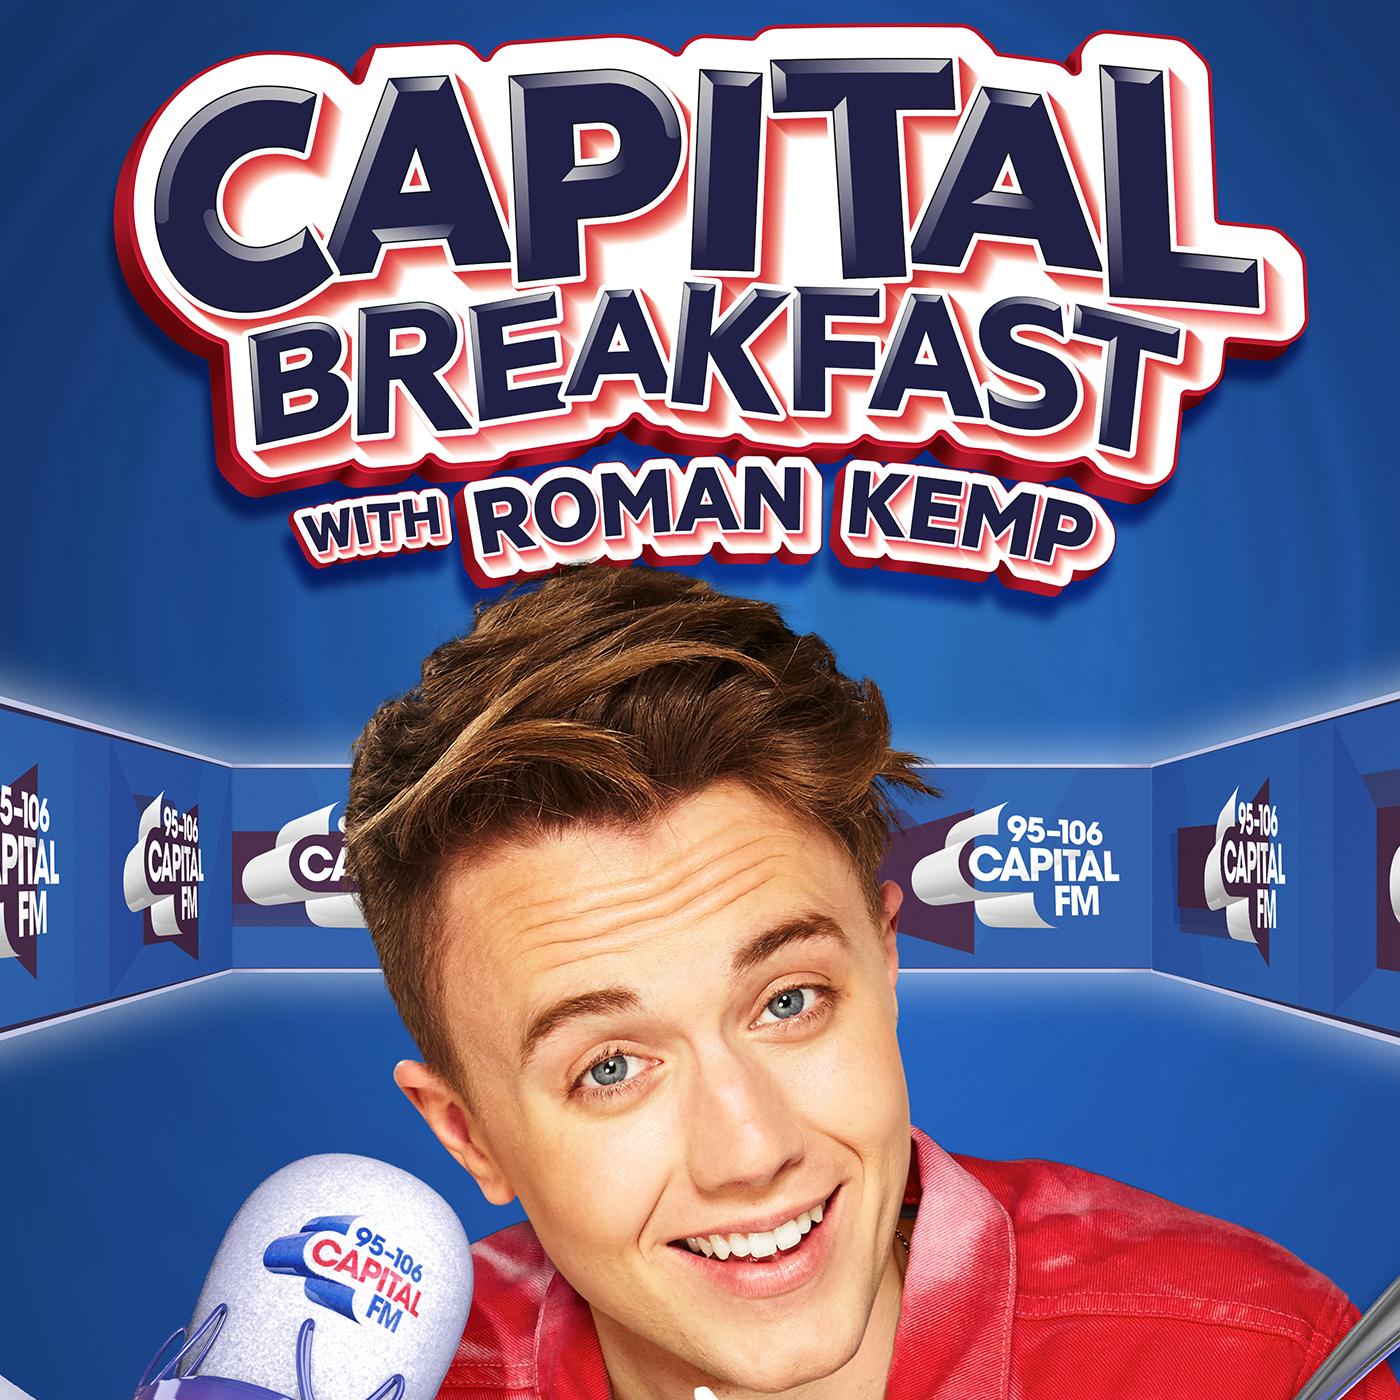 Capital Breakfast with Roman Kemp: The Podcast